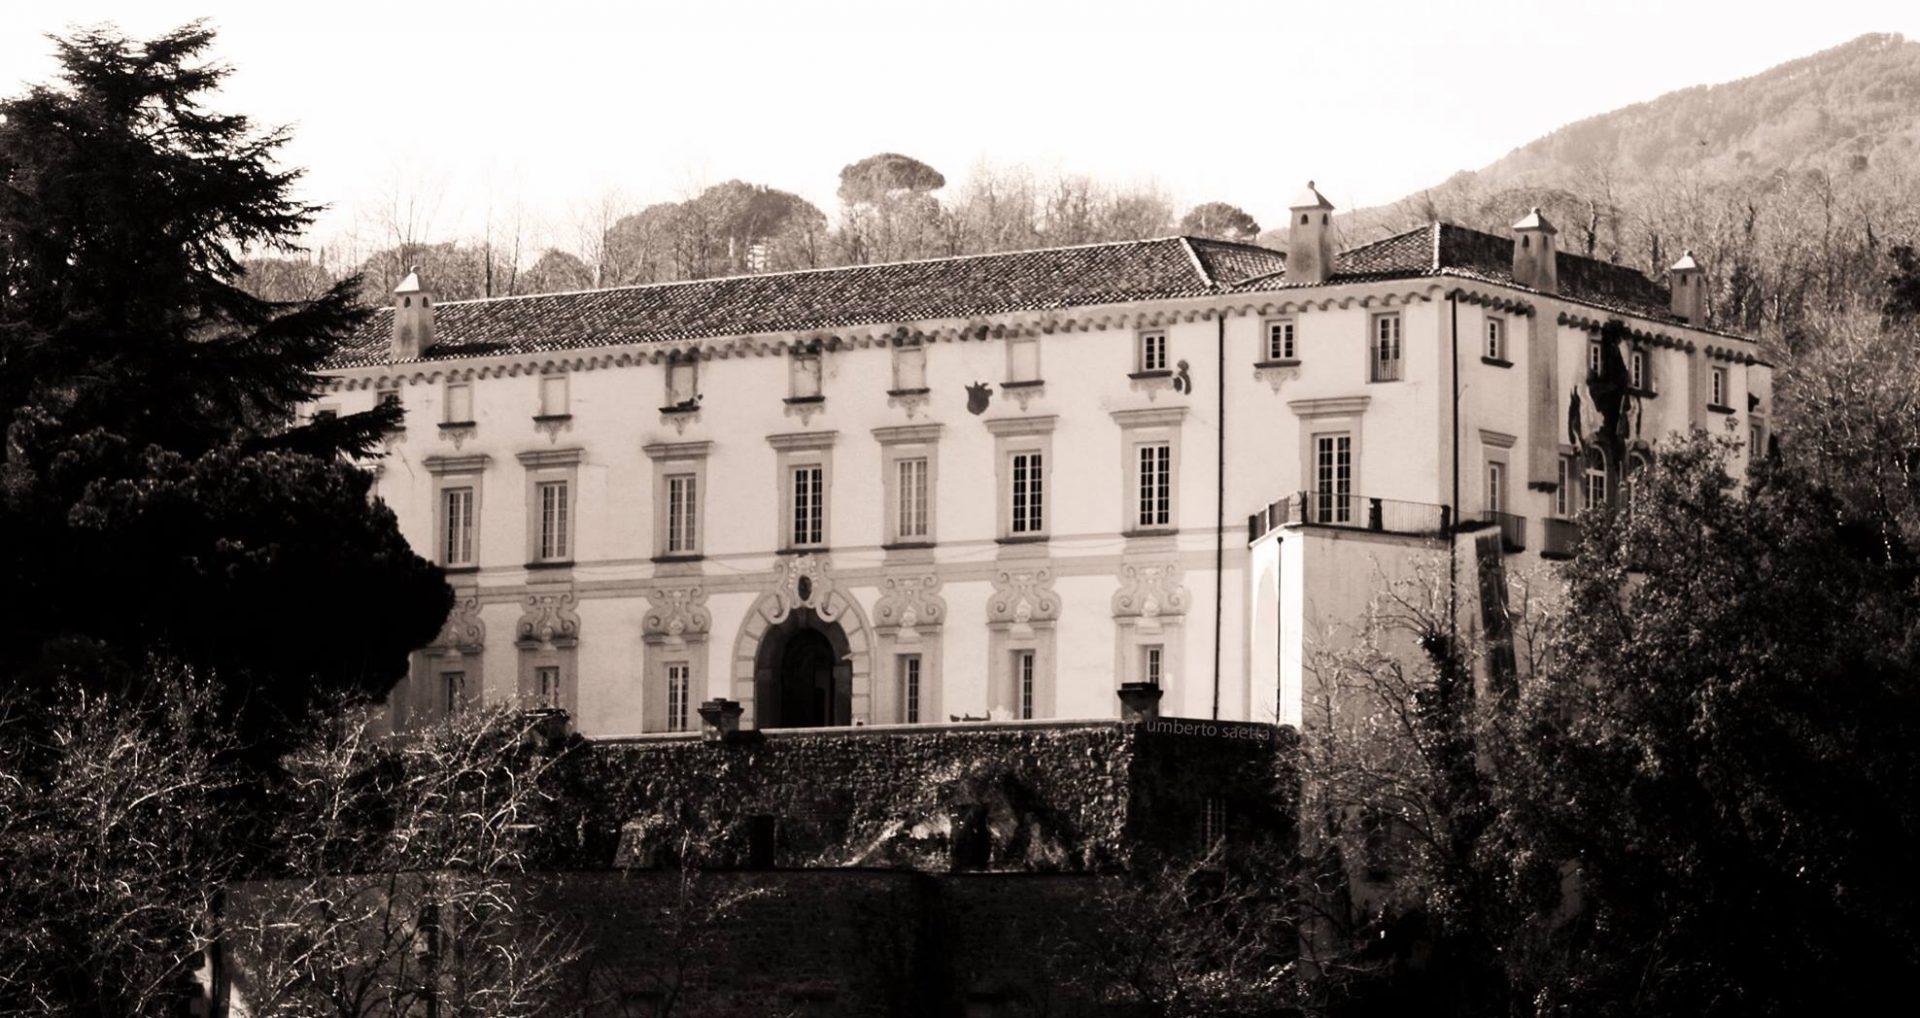 castello mediceo ottaviano